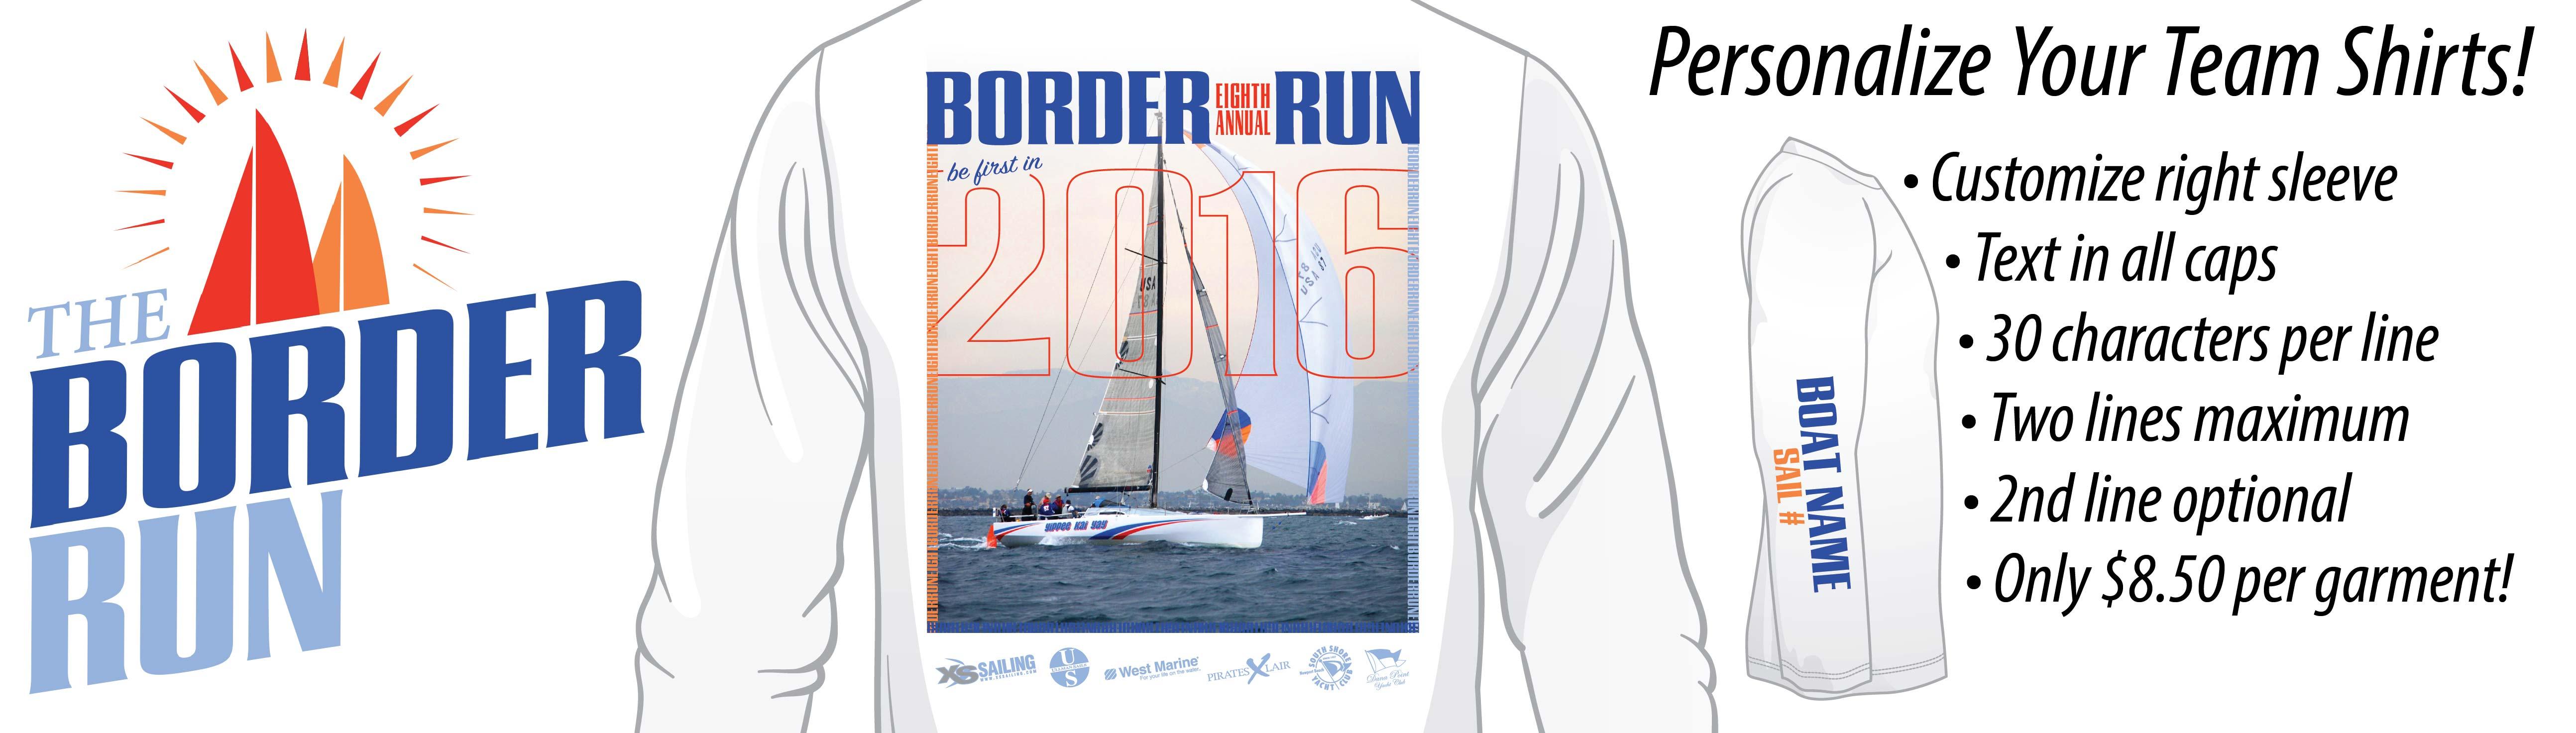 border-run-wicking-shirt-n9119-n9119l-17.jpg